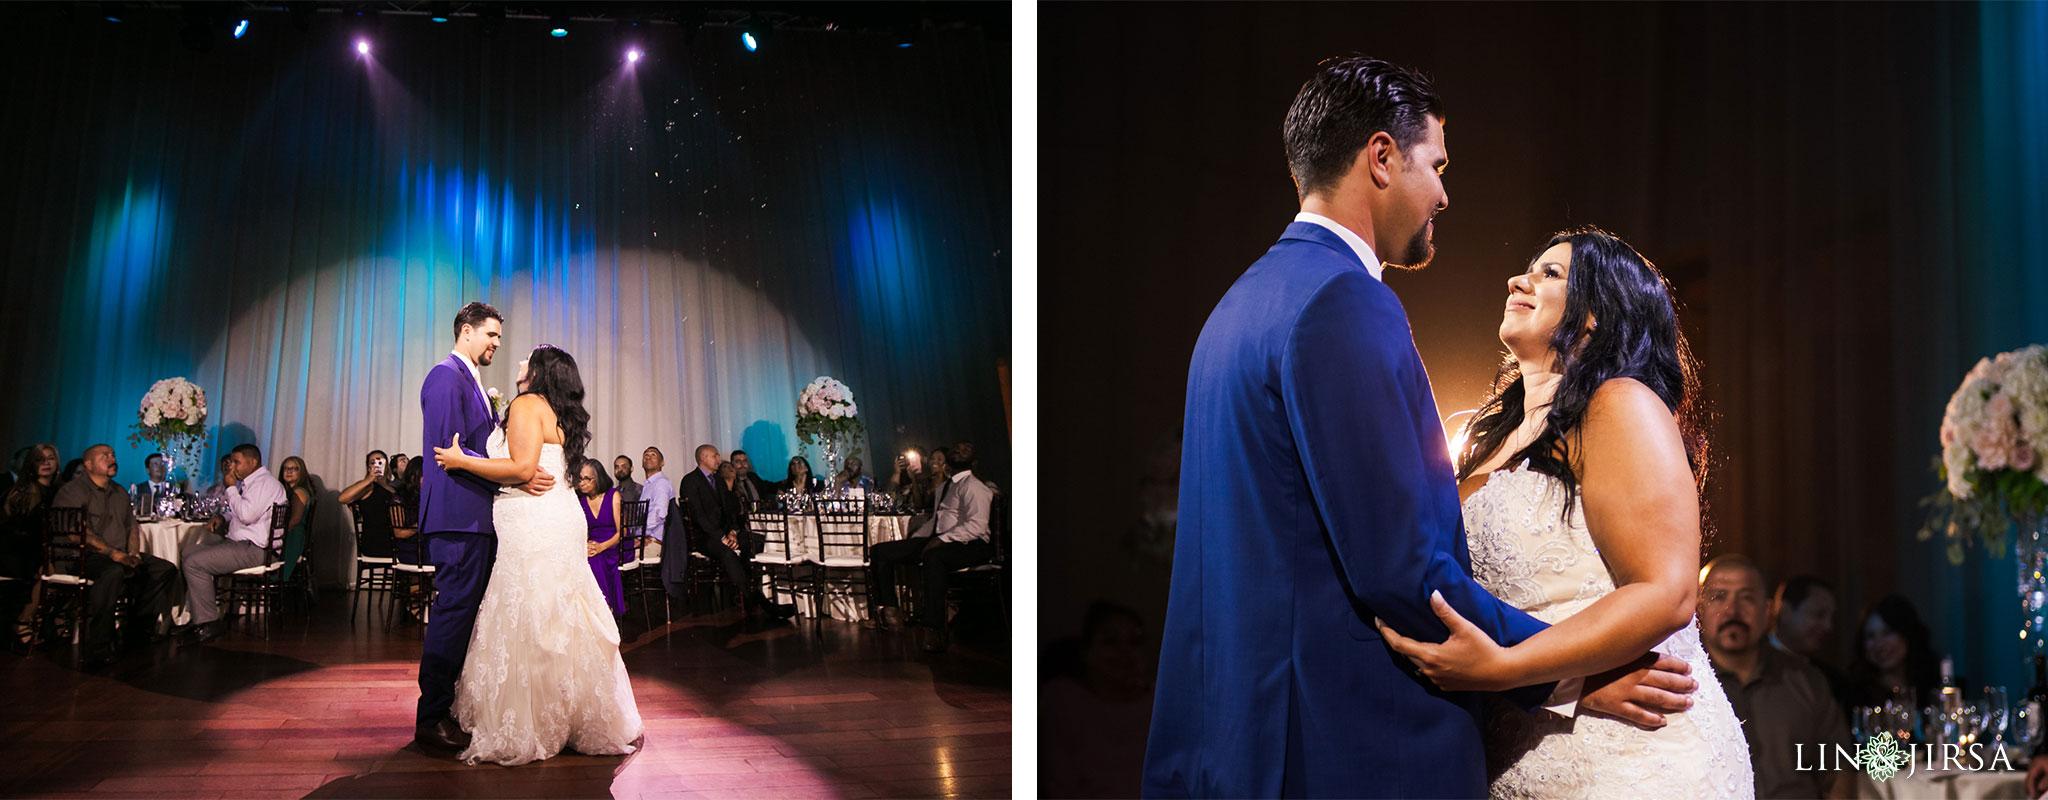 026 padua hills claremont wedding reception photography